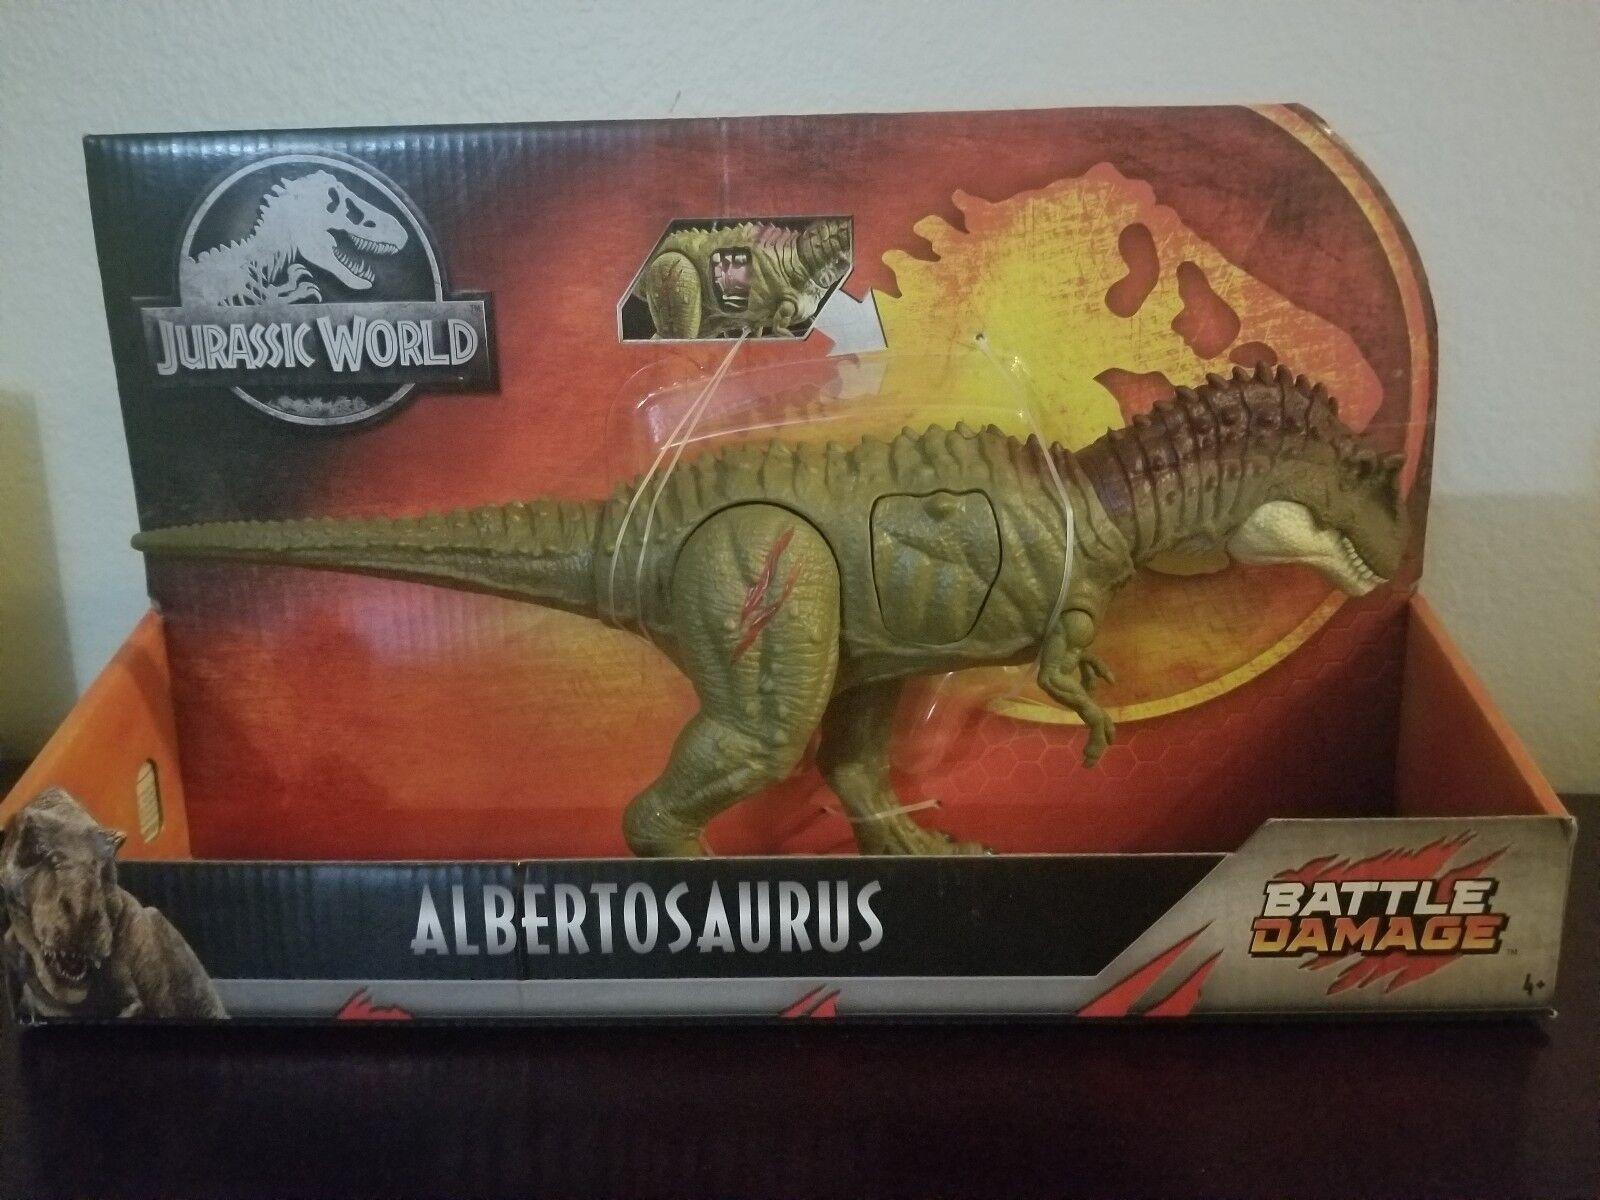 Dino rivalen schaden albertosaurus jurassic welt